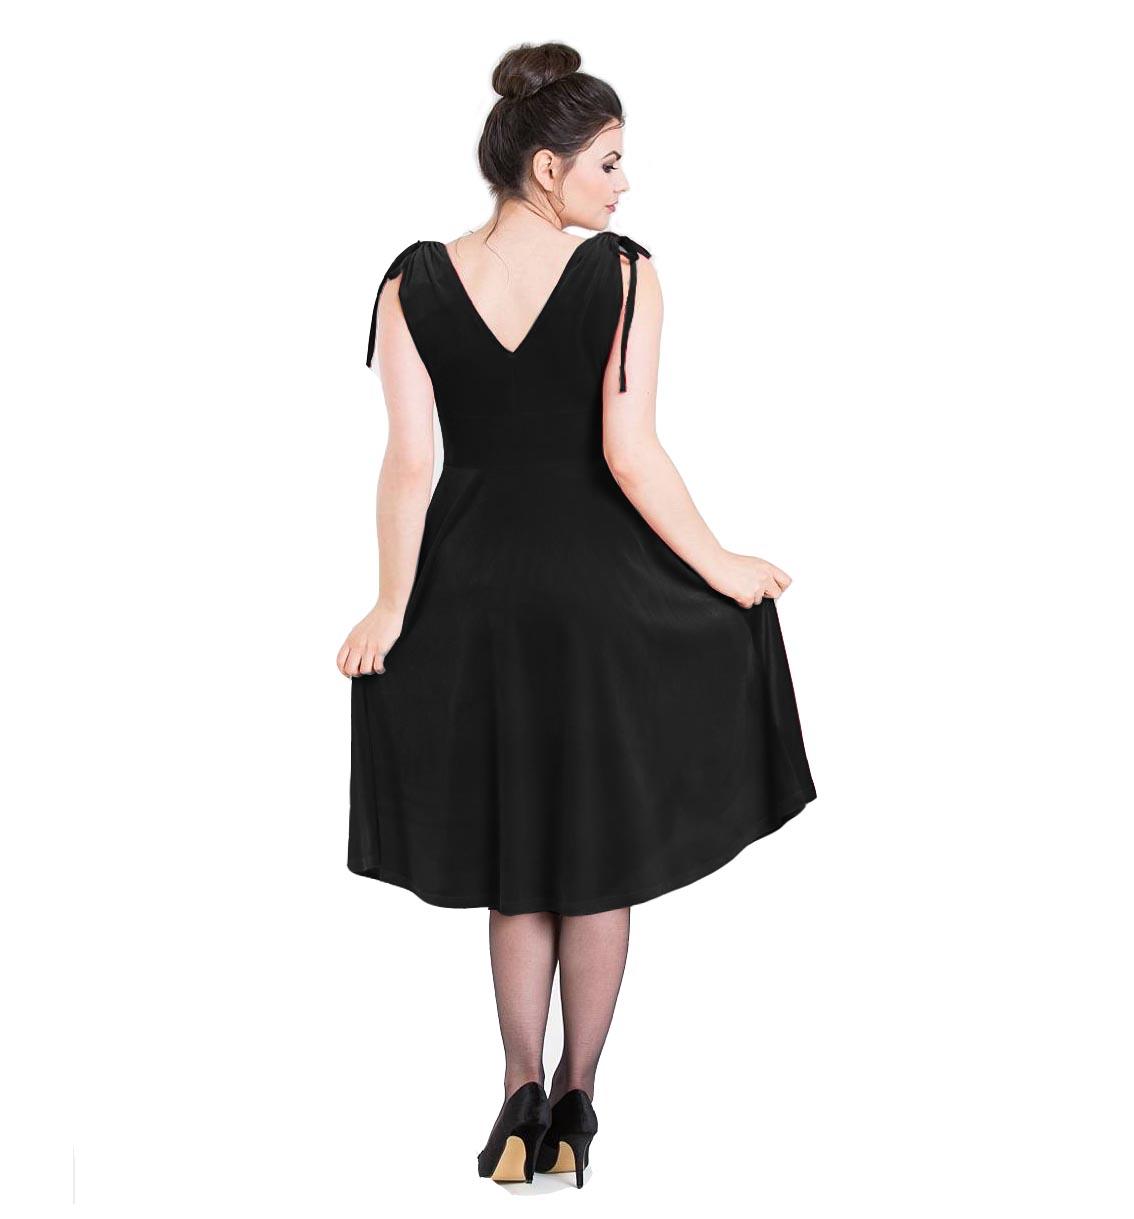 Hell-Bunny-40s-50s-Elegant-Pin-Up-Dress-MELINA-Crushed-Velvet-Black-All-Sizes thumbnail 13